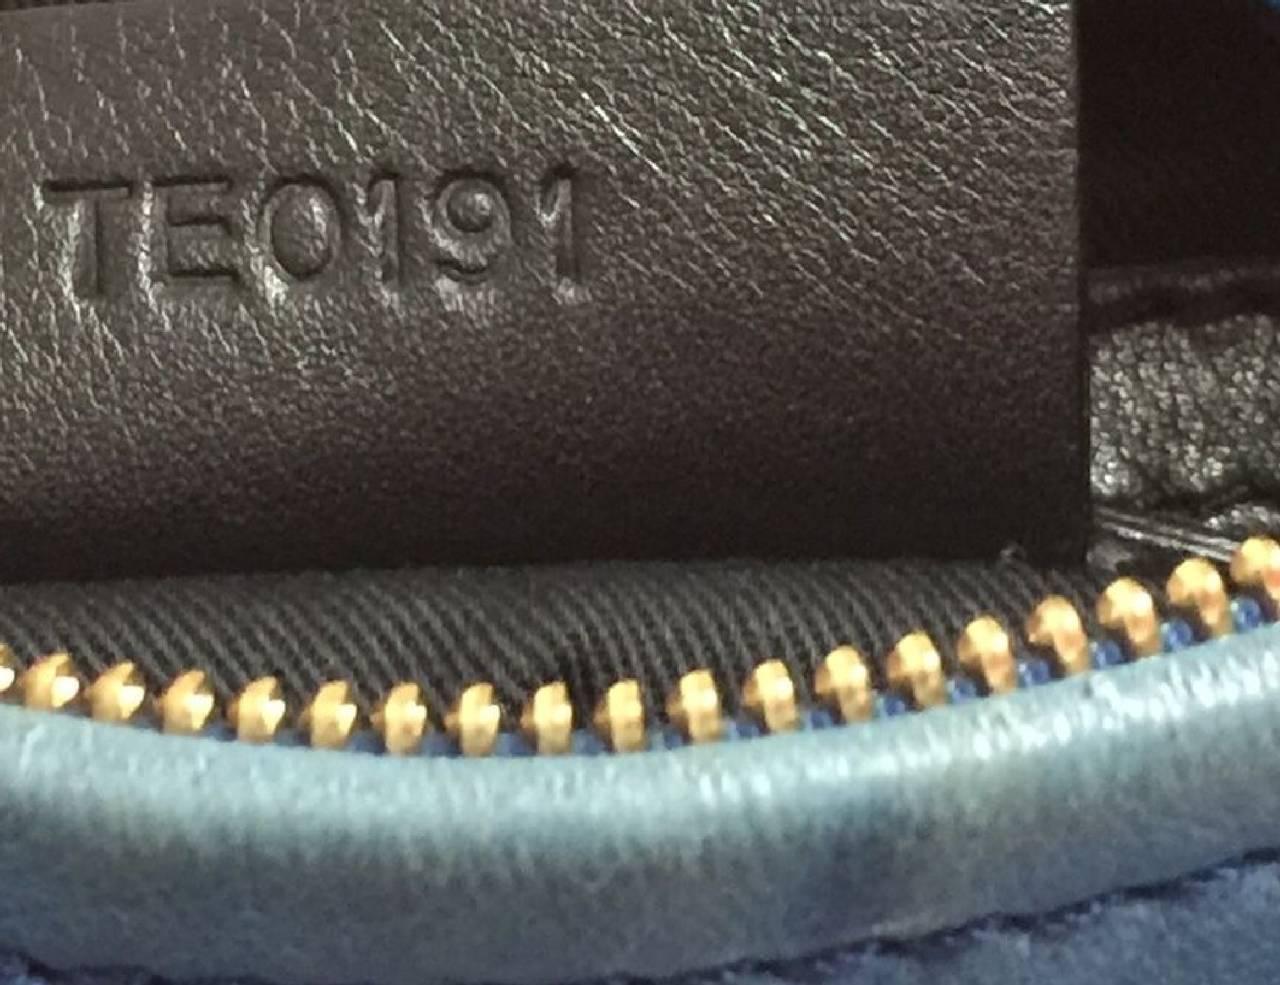 Givenchy Pandora Bag Leather Mini 7